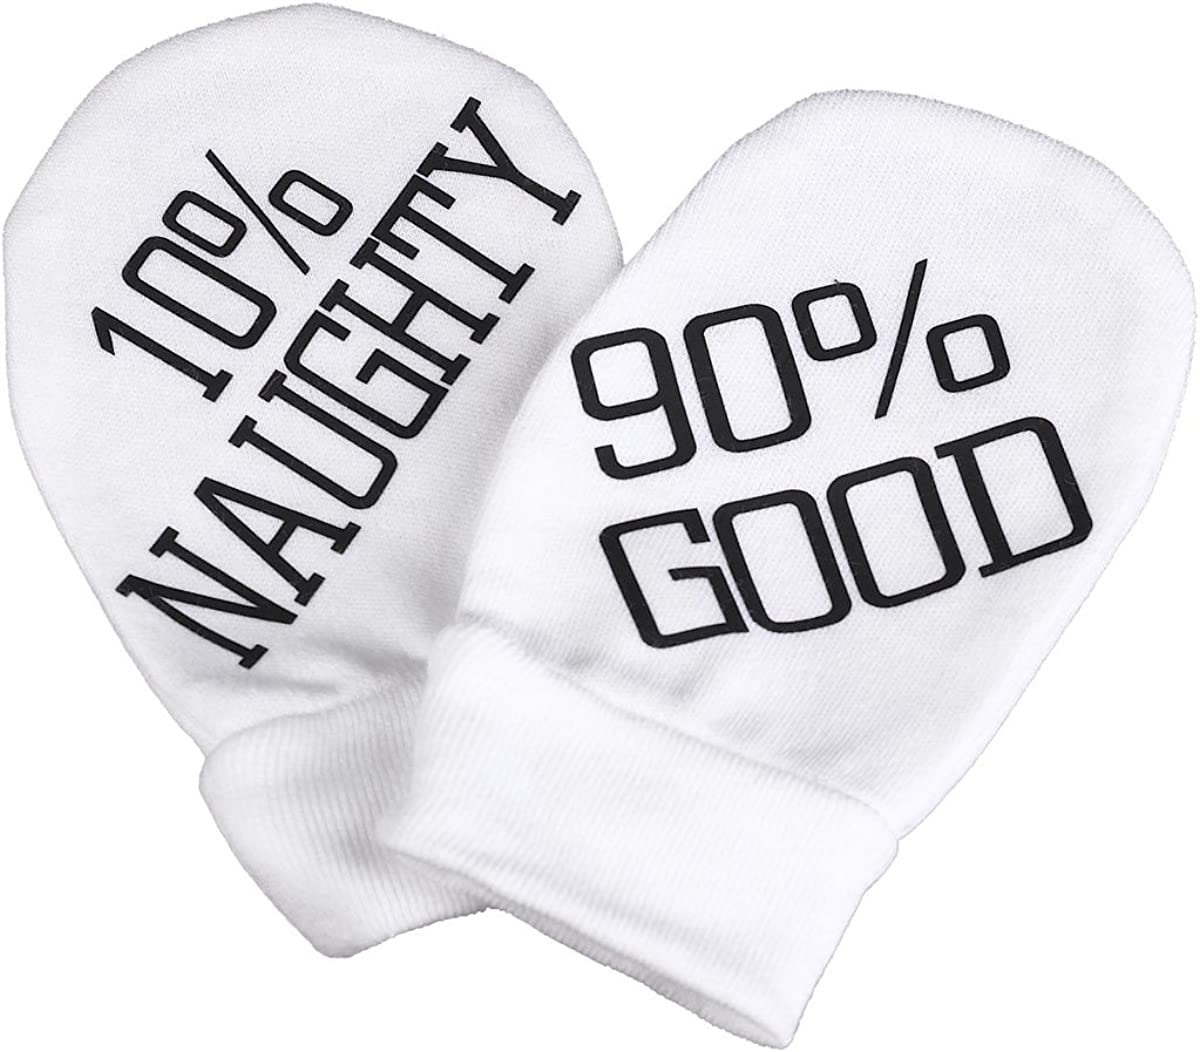 Spoilt Rotten - Naughty & Good 100% Organic Cotton Baby Mittens Baby Gloves